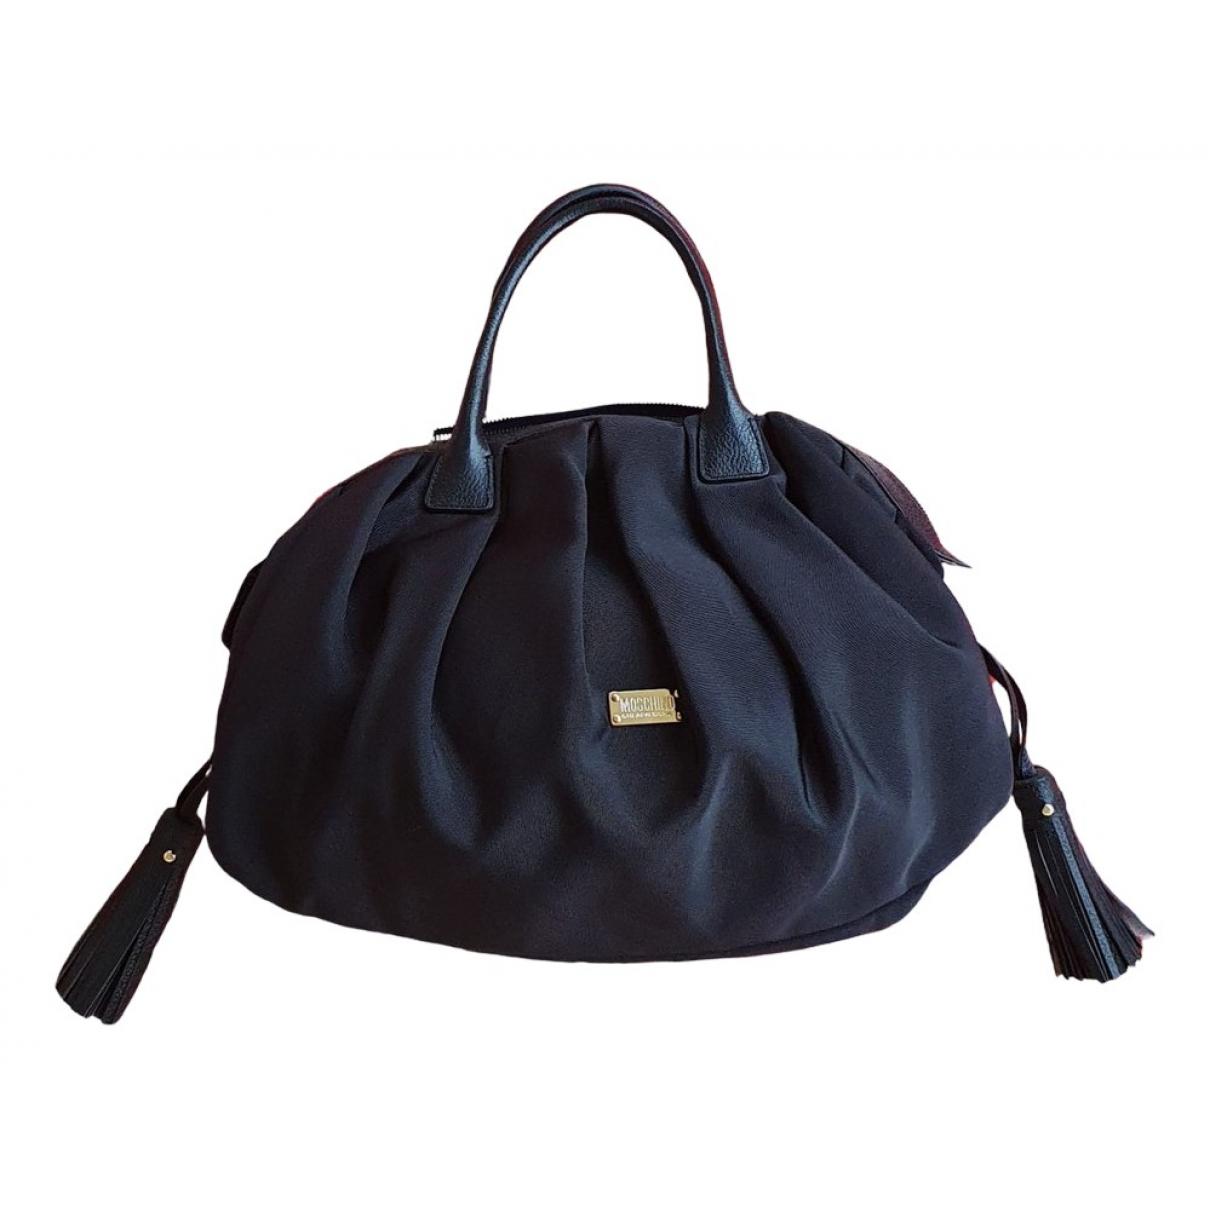 Moschino N Black handbag for Women N